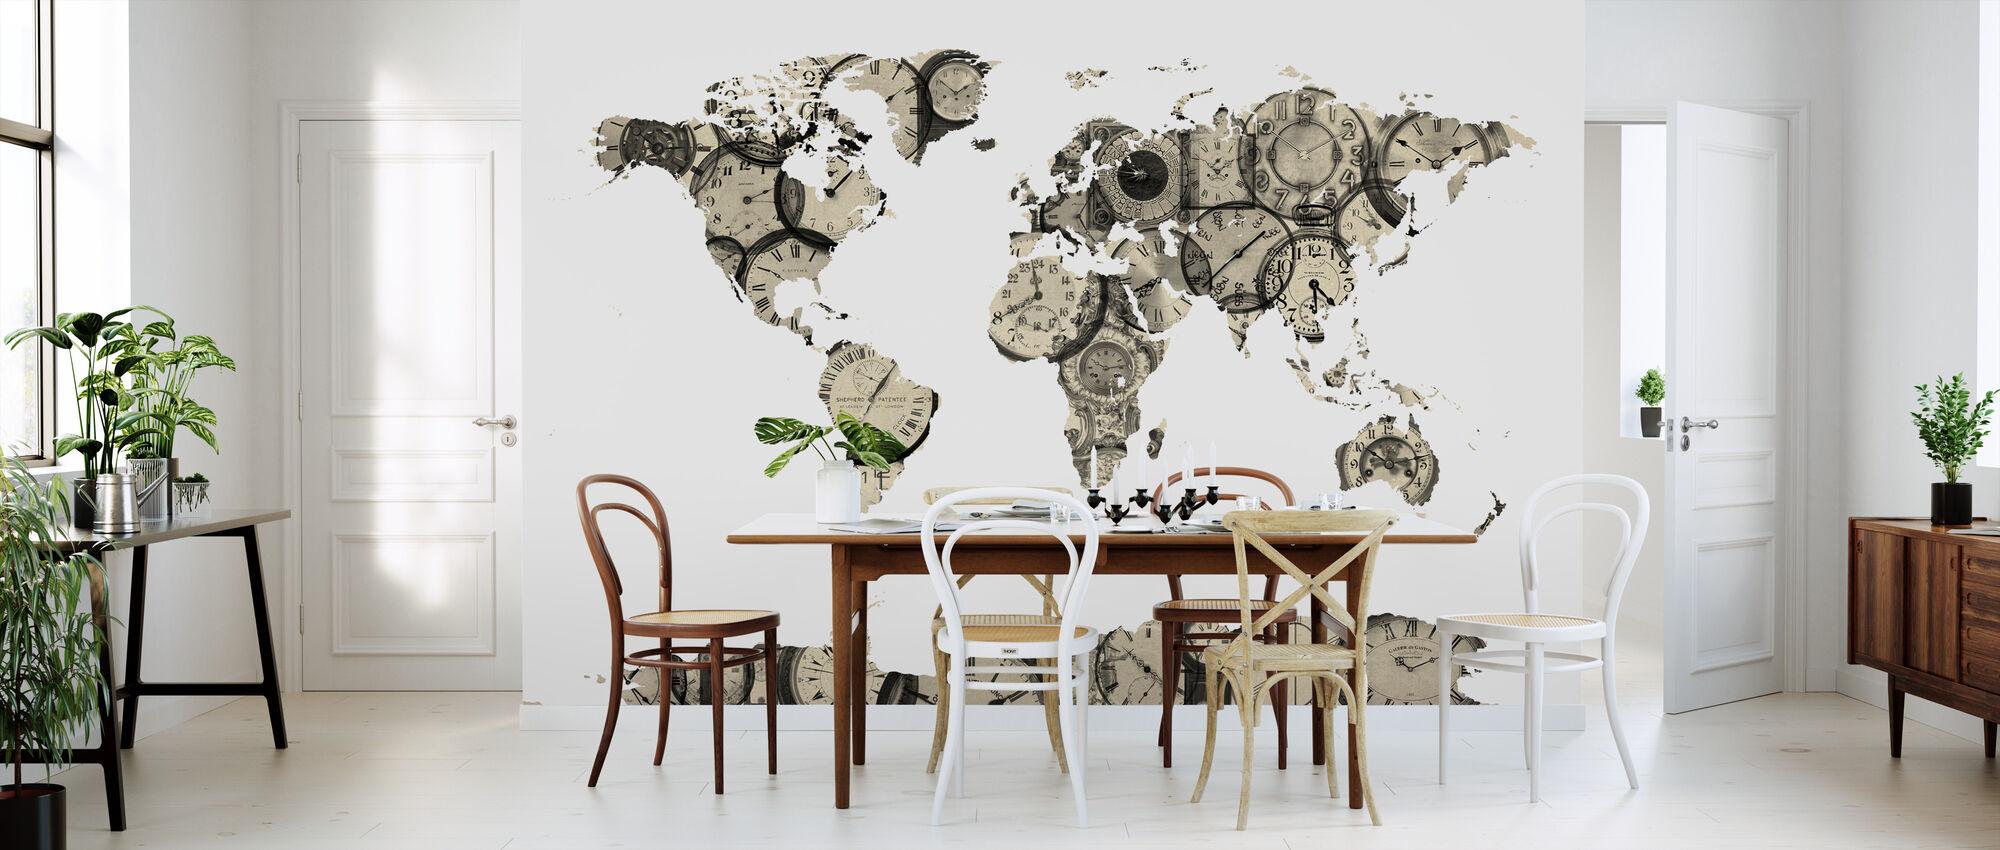 Old Clocks World Map - Wallpaper - Kitchen